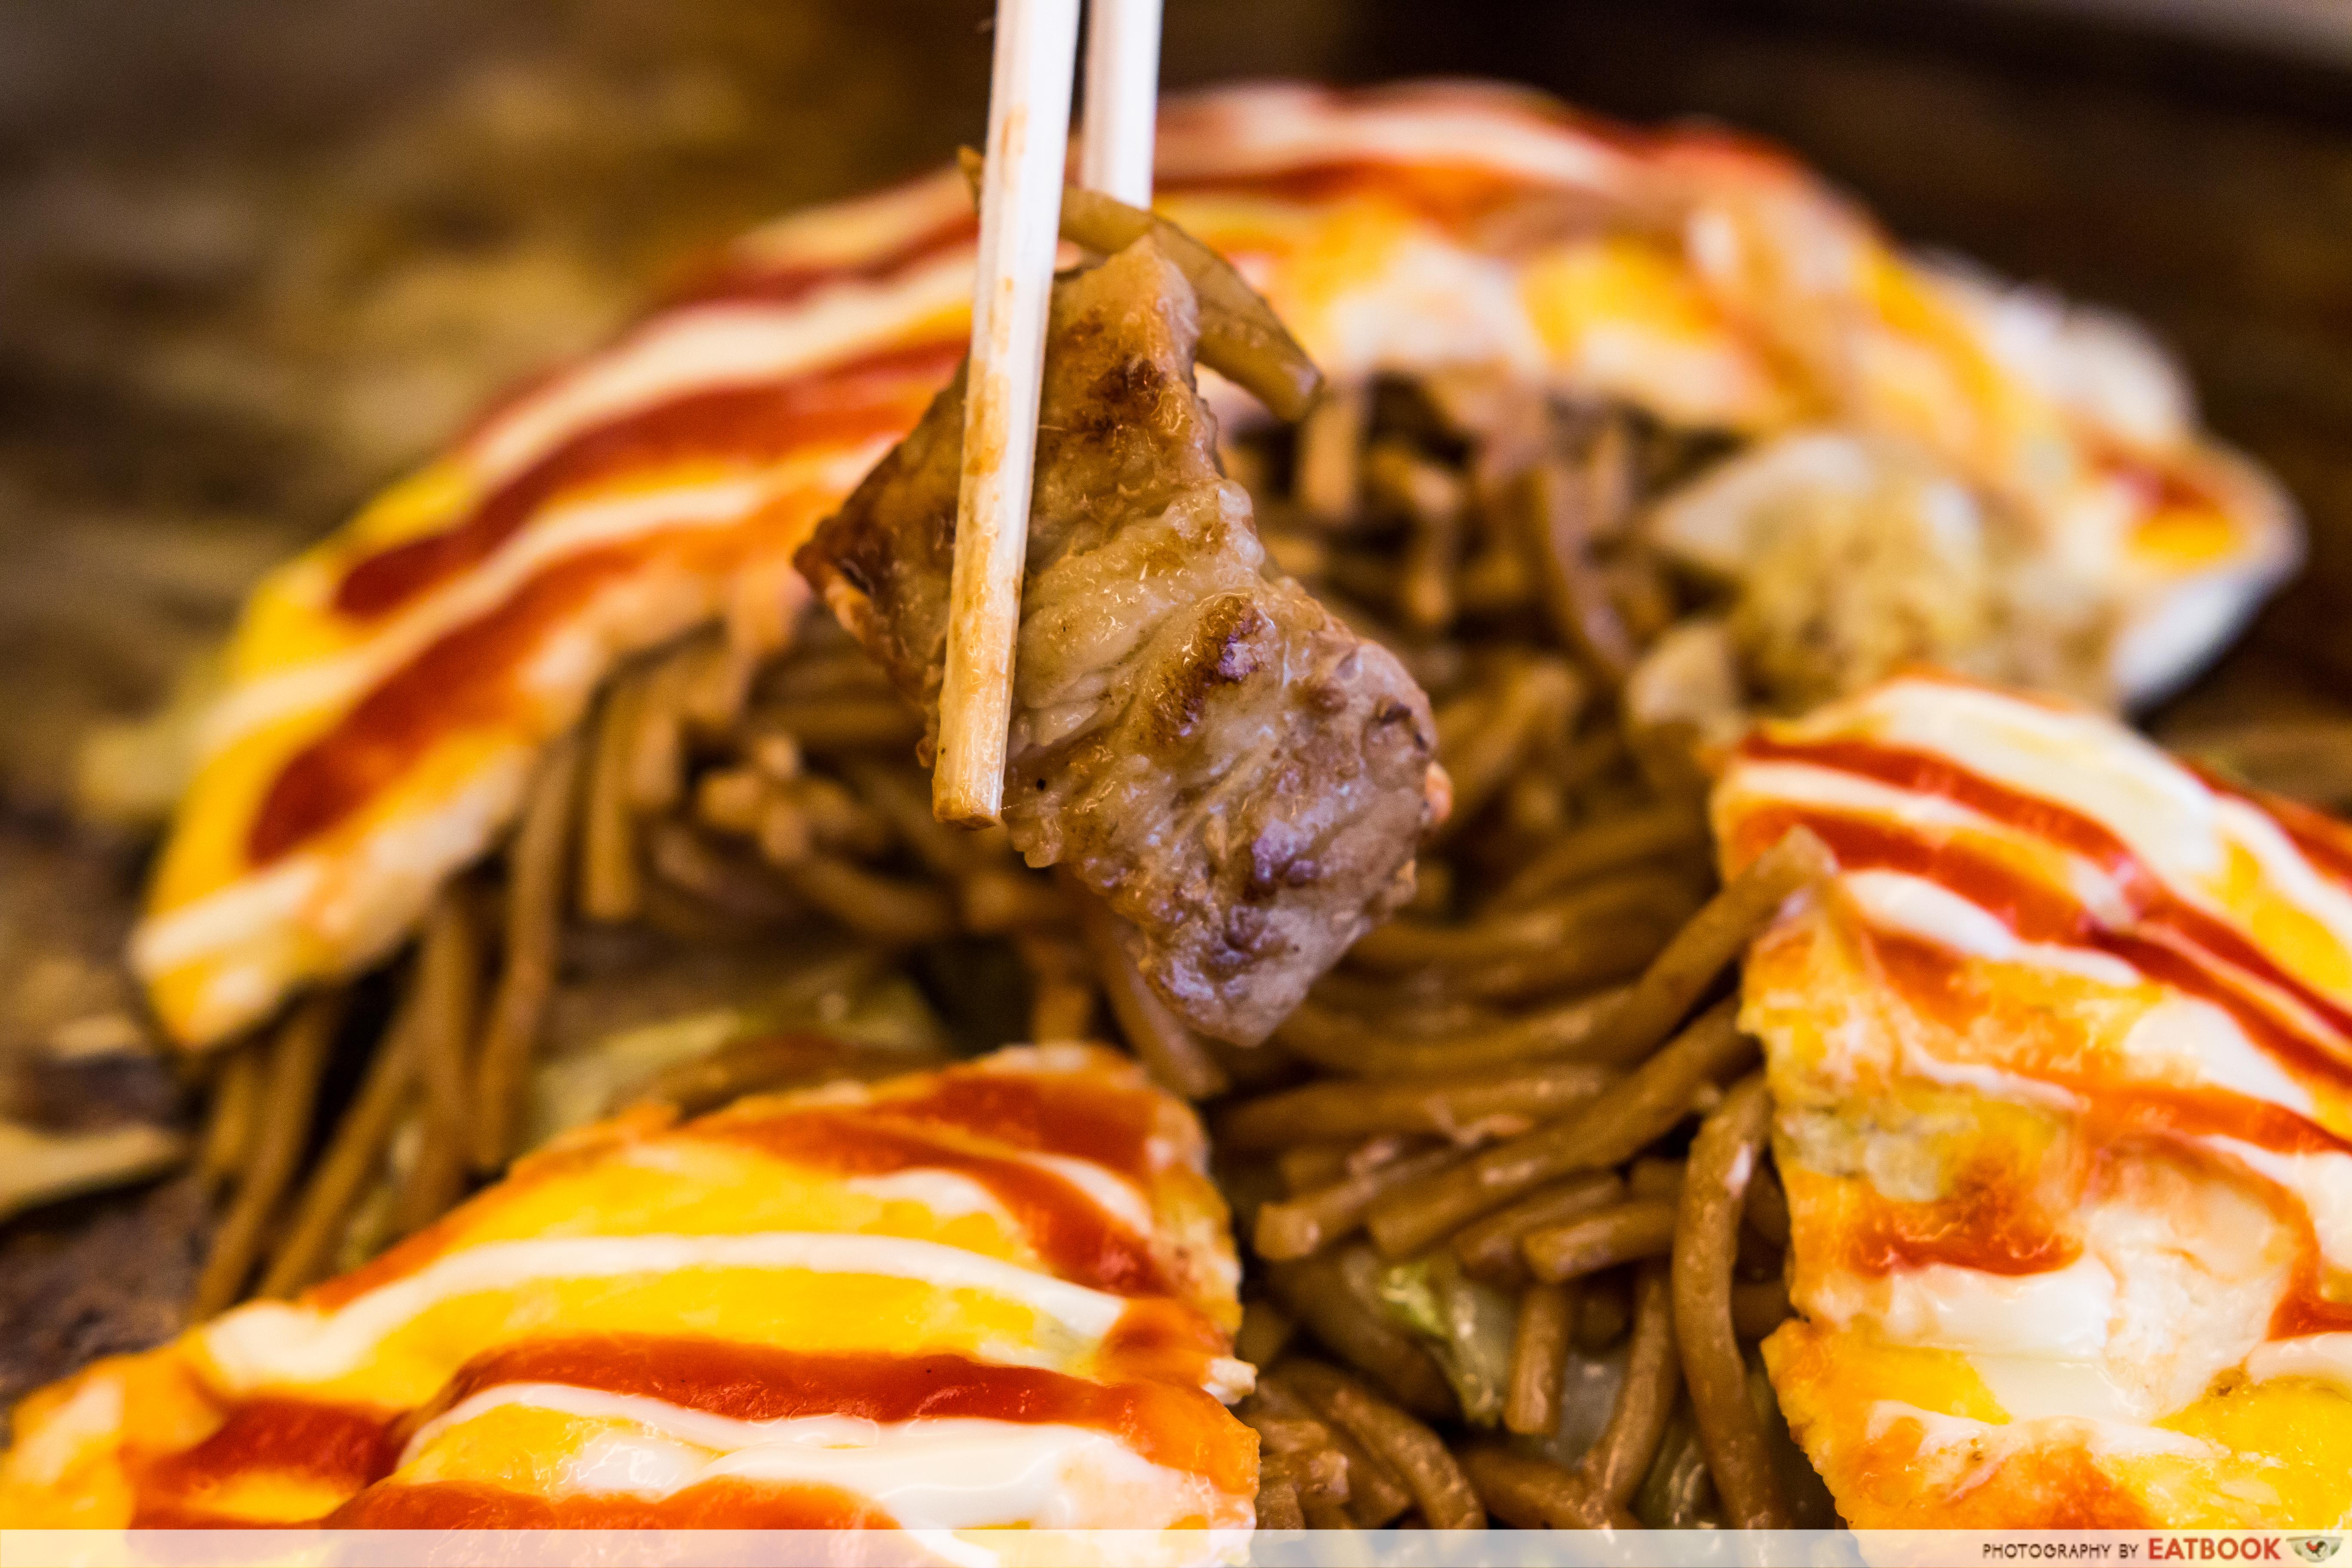 Fugetsu- yakisoba pork